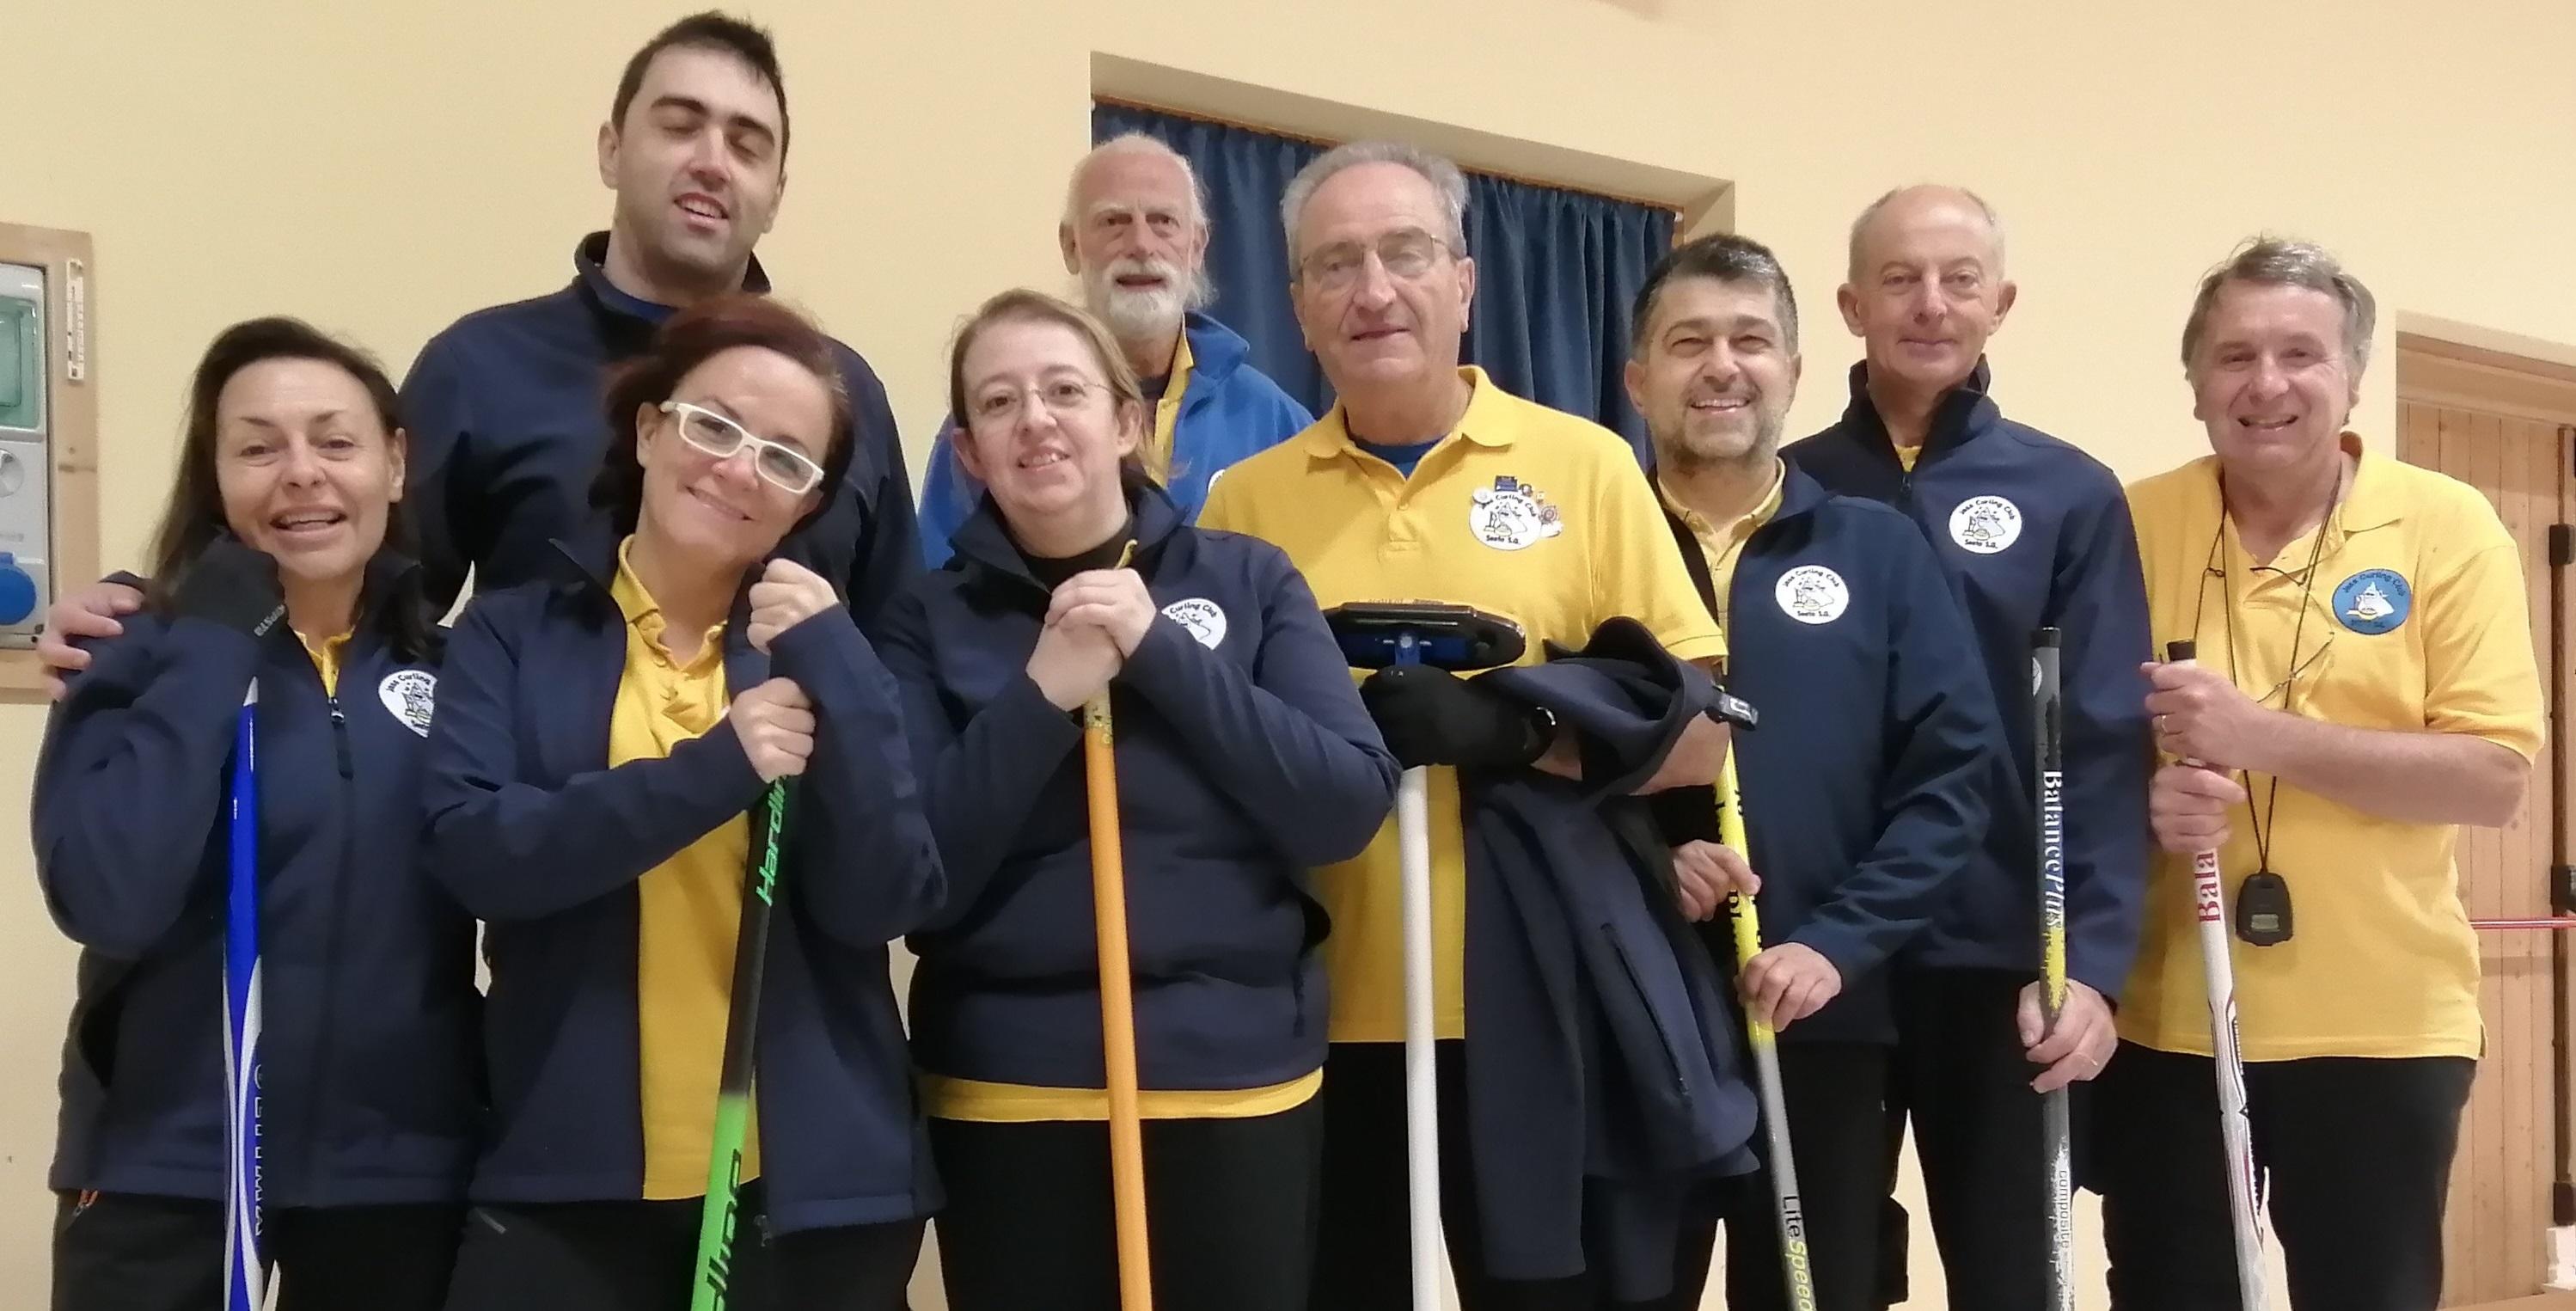 Torneo Caneve En Festa, Cembra 18/20 ottobre 2019